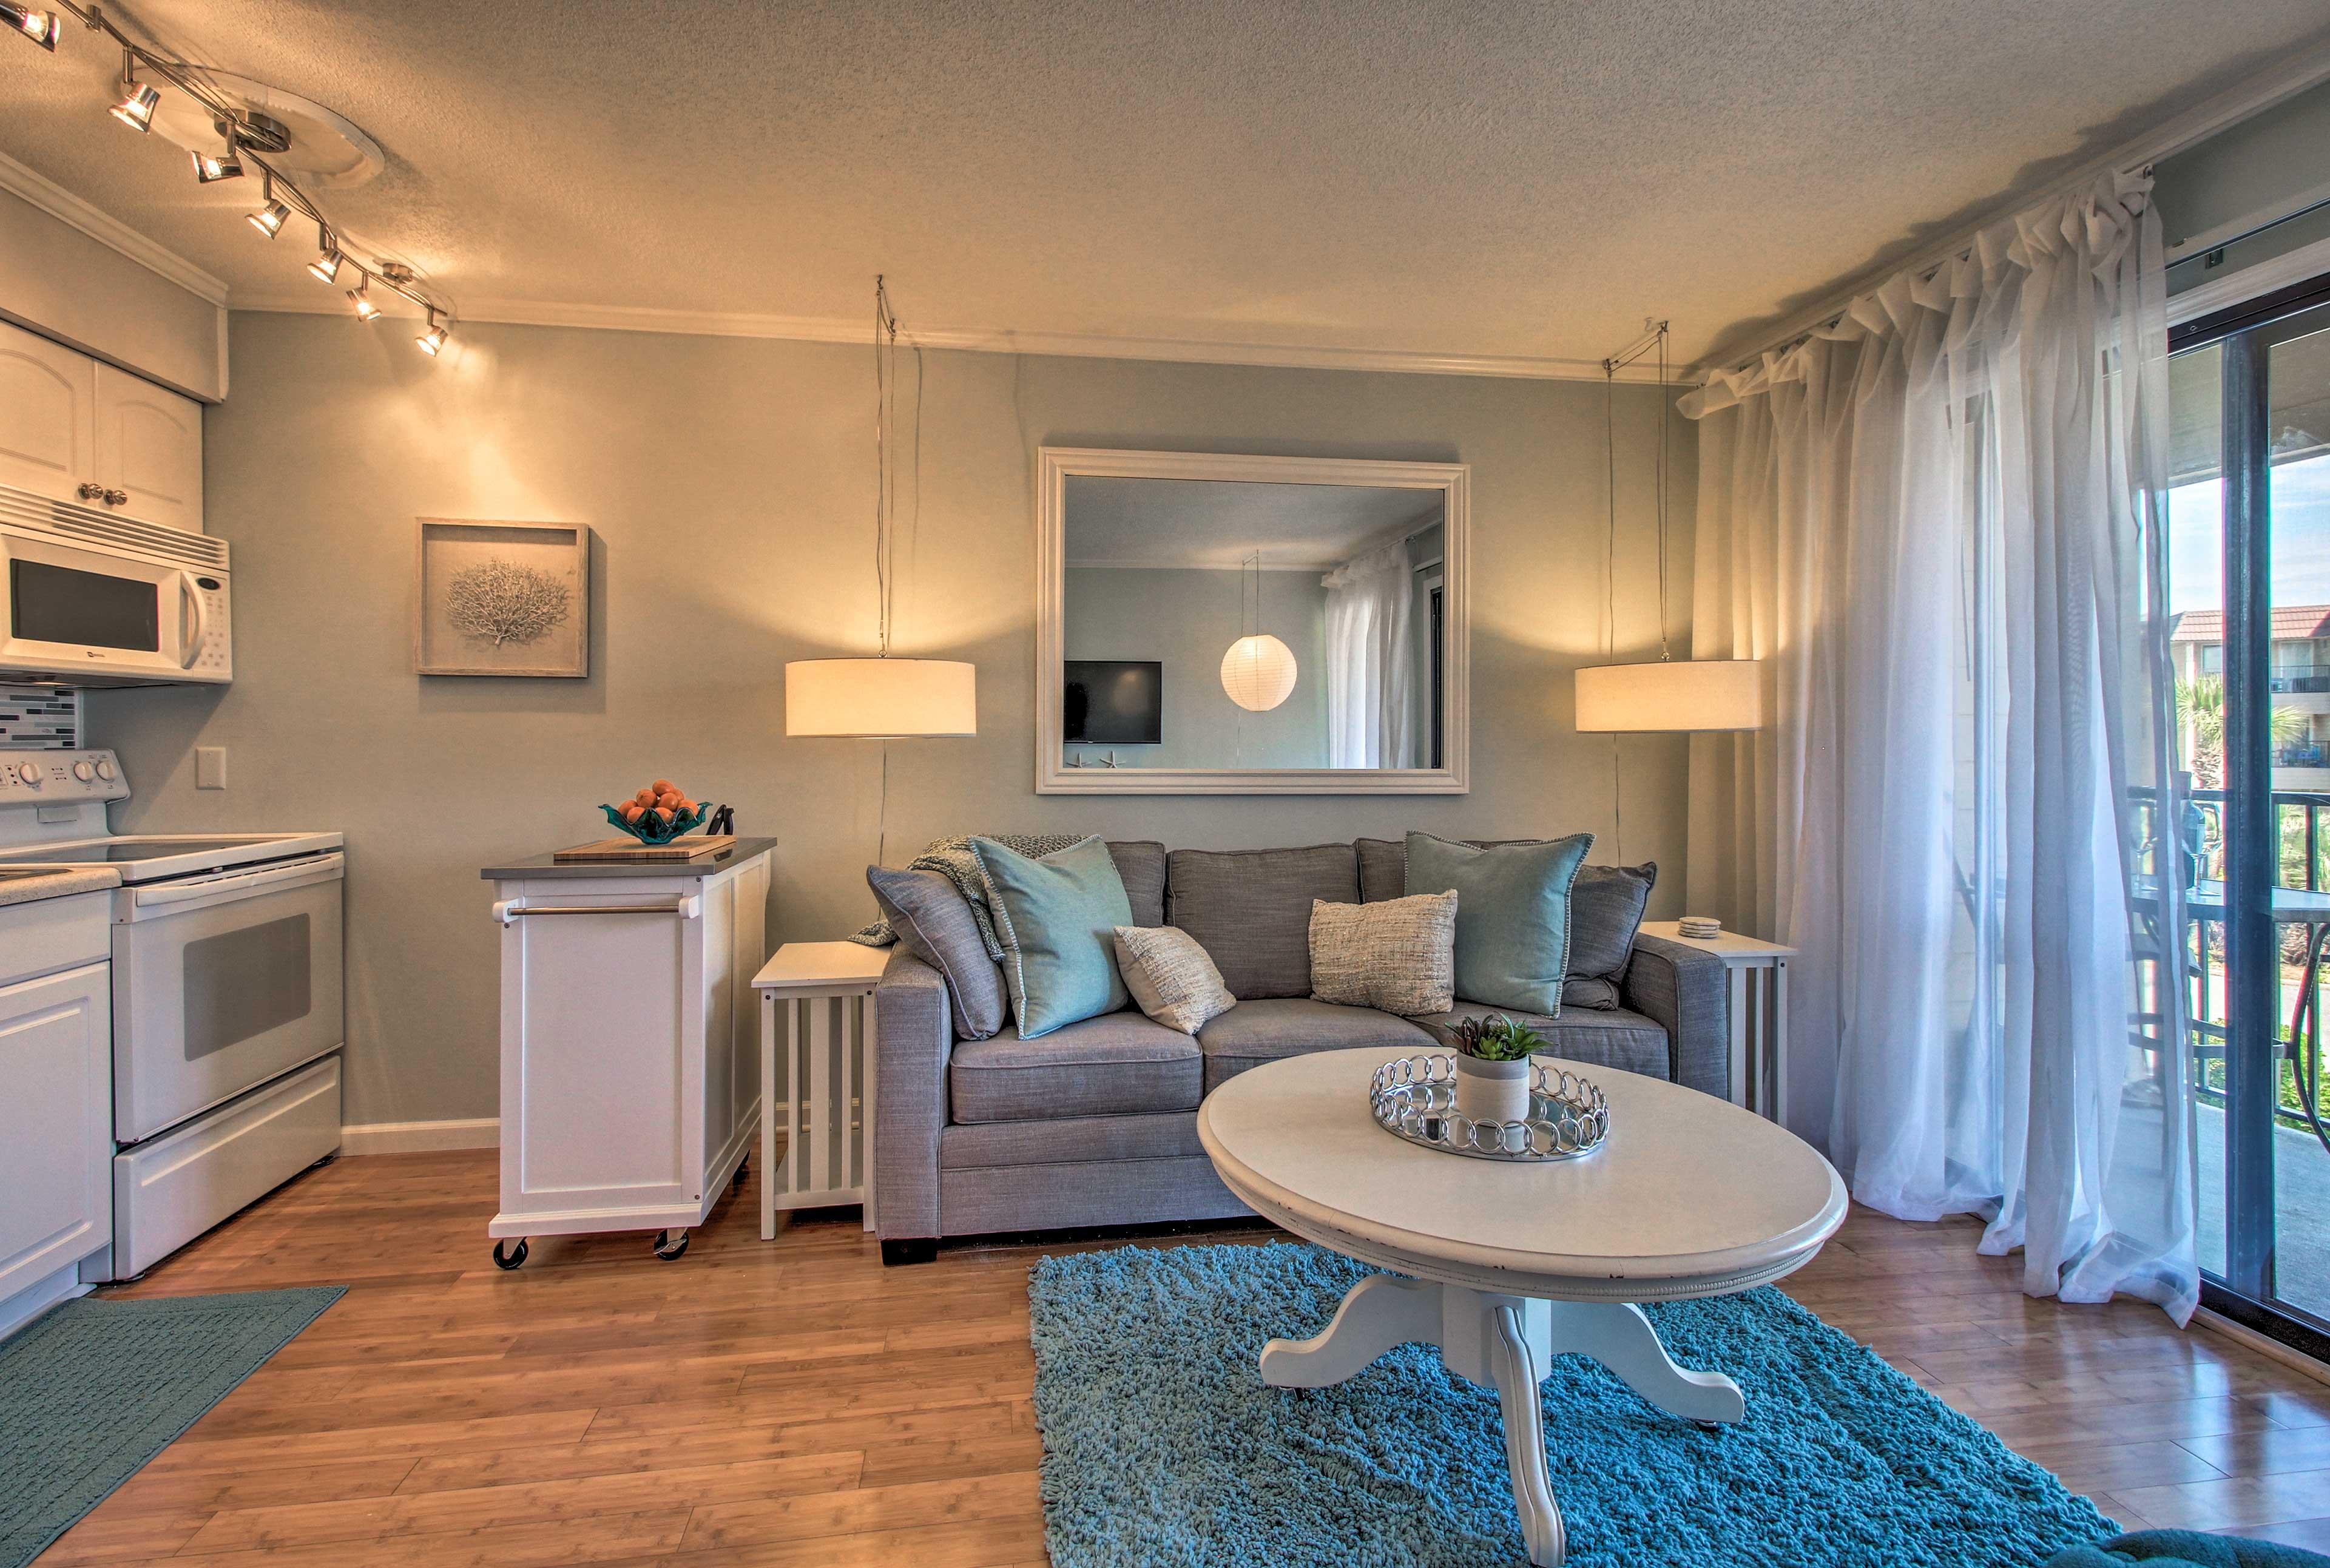 Coastal decor and plush furnishings elevate this home.